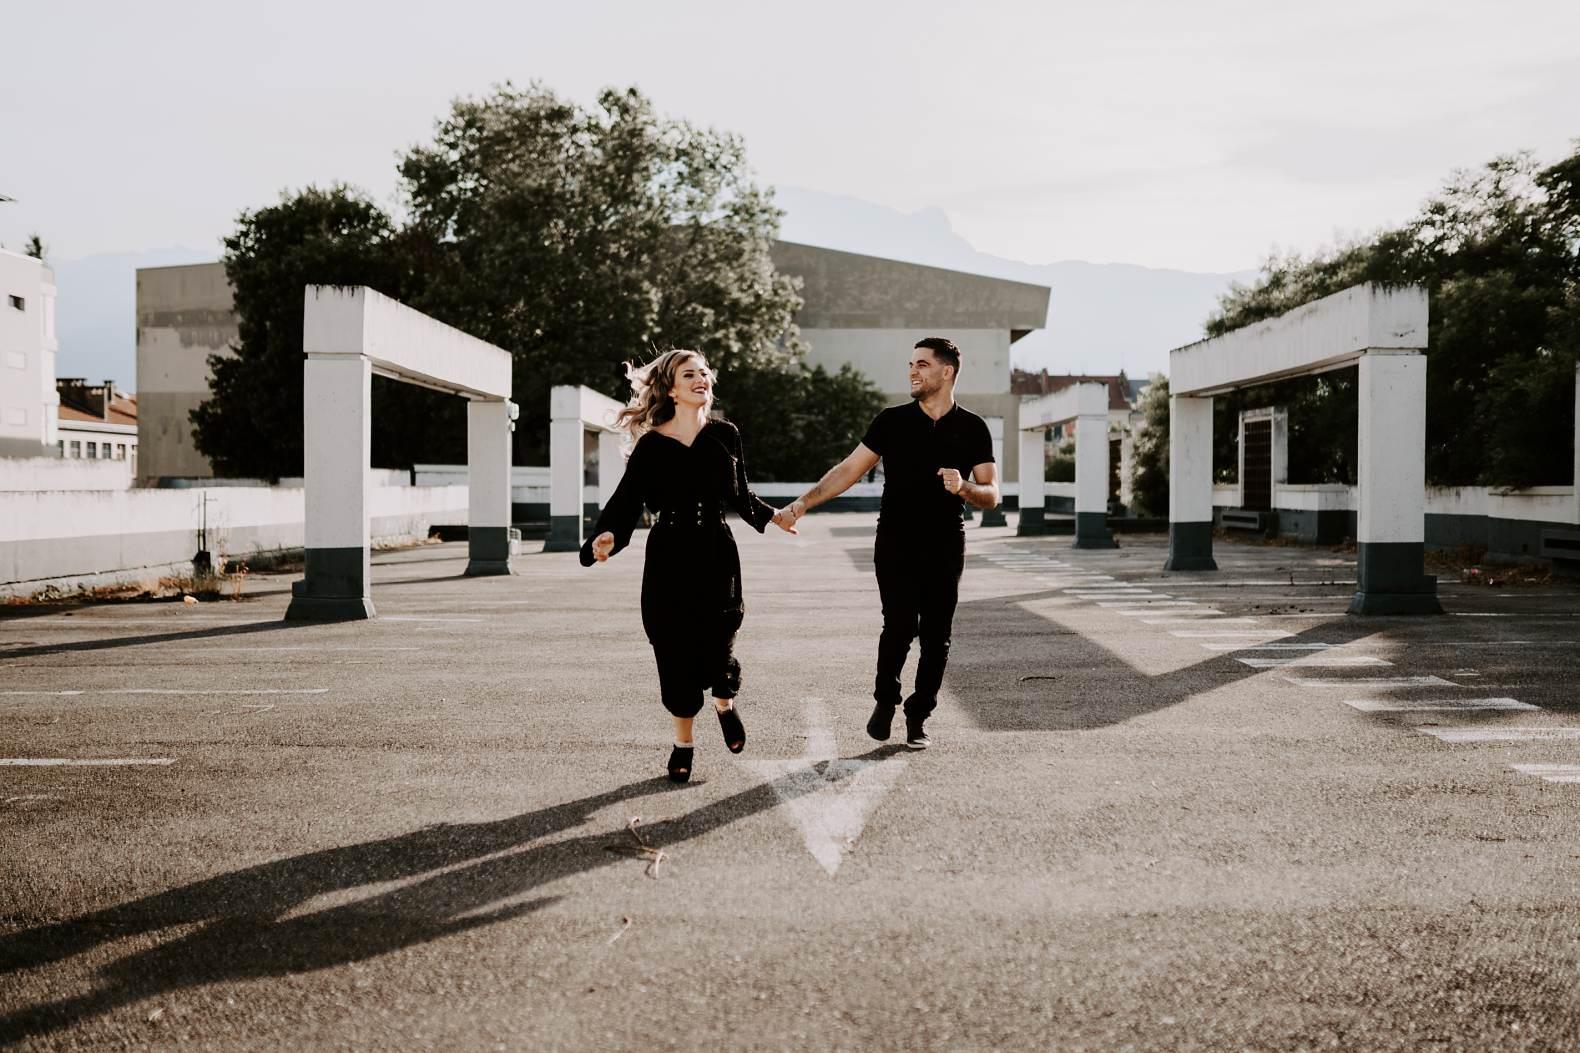 seance couple urbain grenoble chartreuse photographe bel esprit 0001